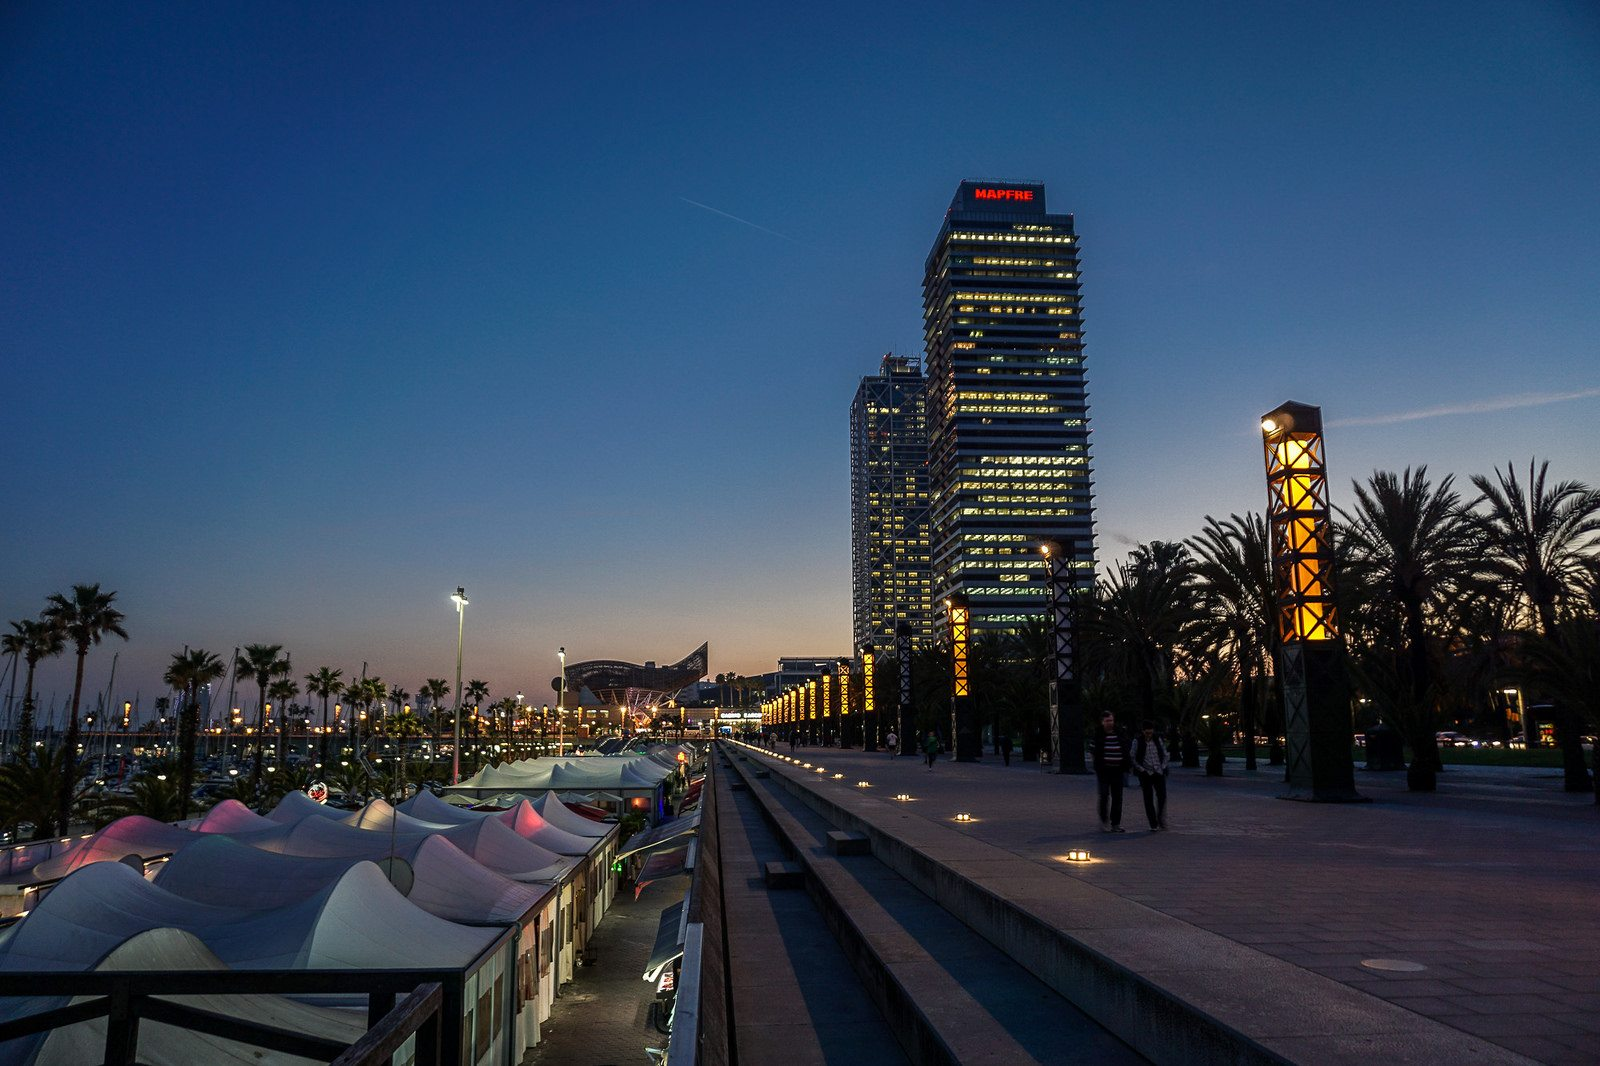 Олимпийский порт Барселоны вечером